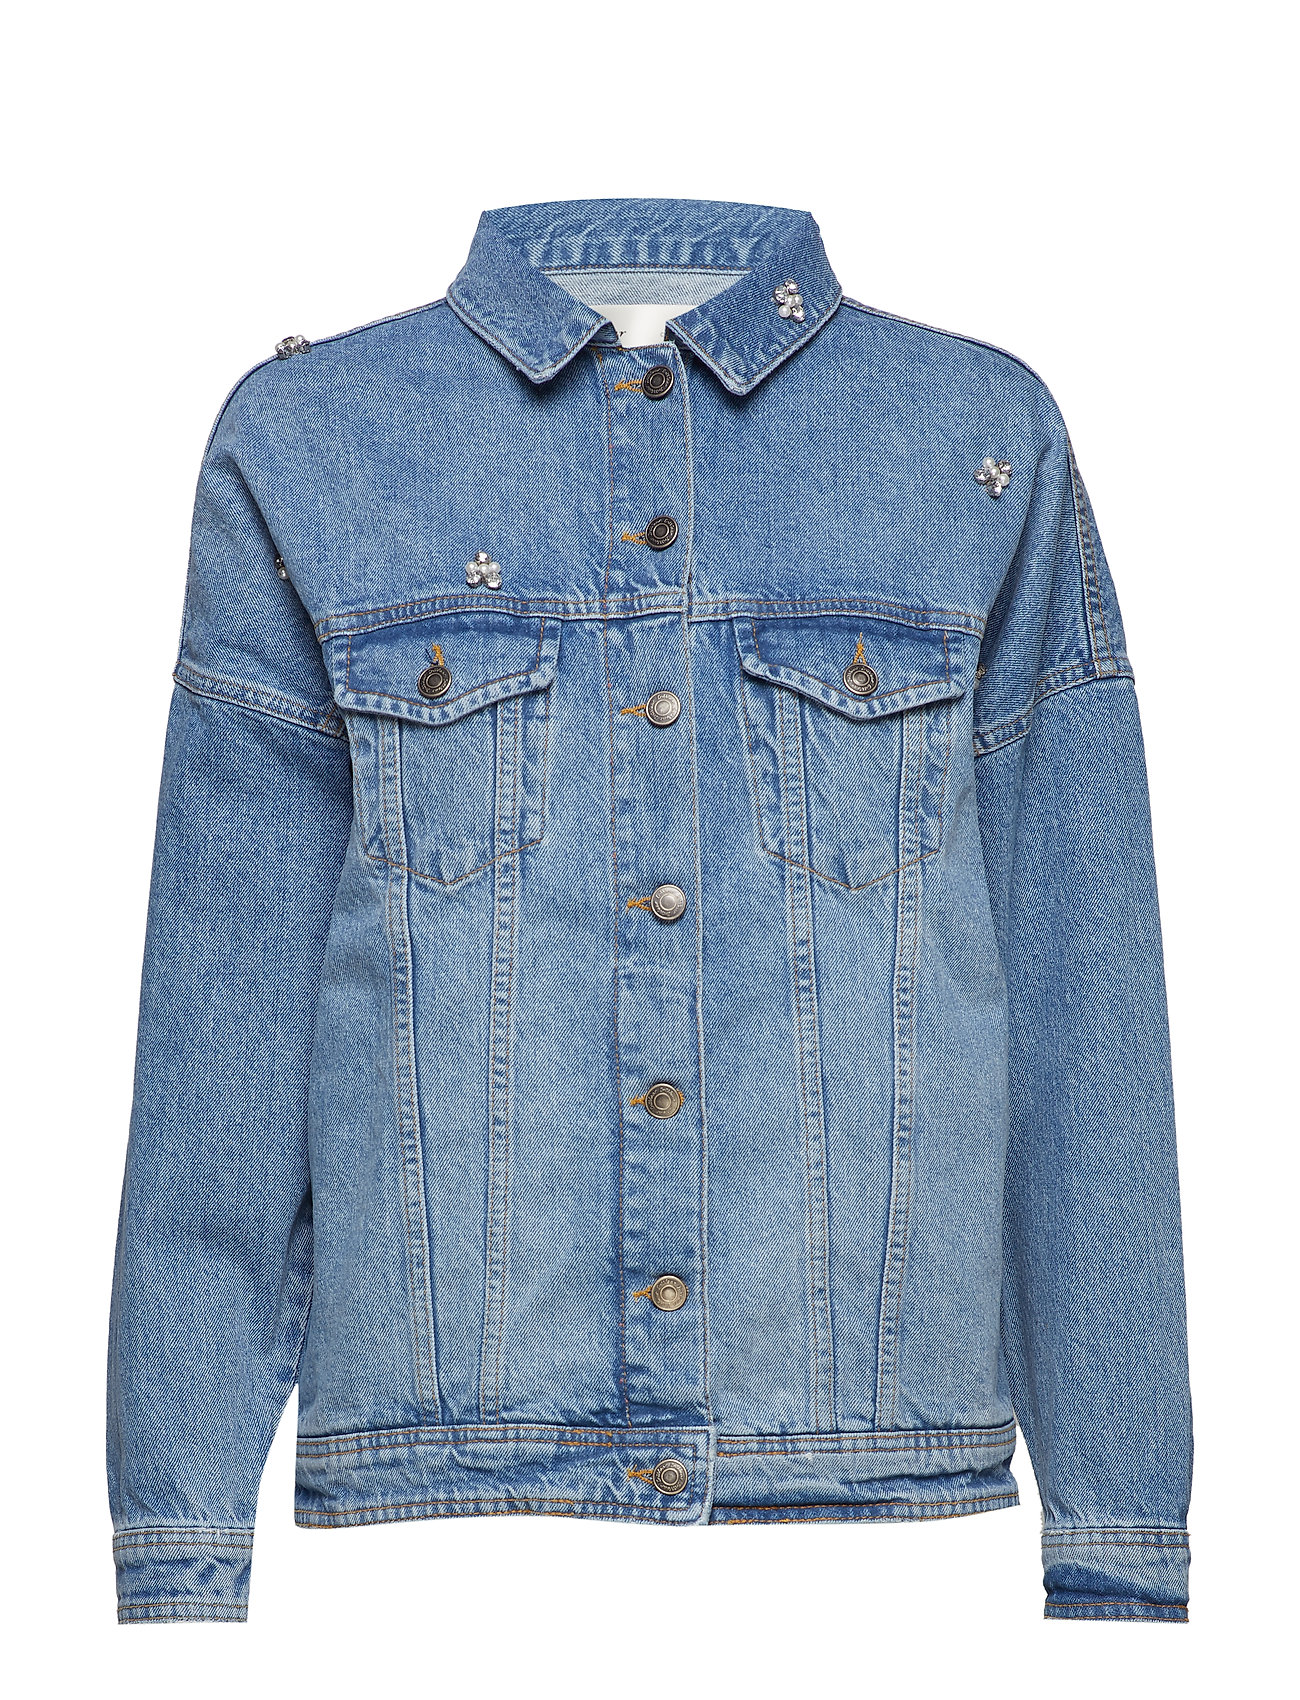 Jacketmedium VintageInwear Dorelle Jeans Jeans VintageInwear Jacketmedium Dorelle 34RqL5Aj